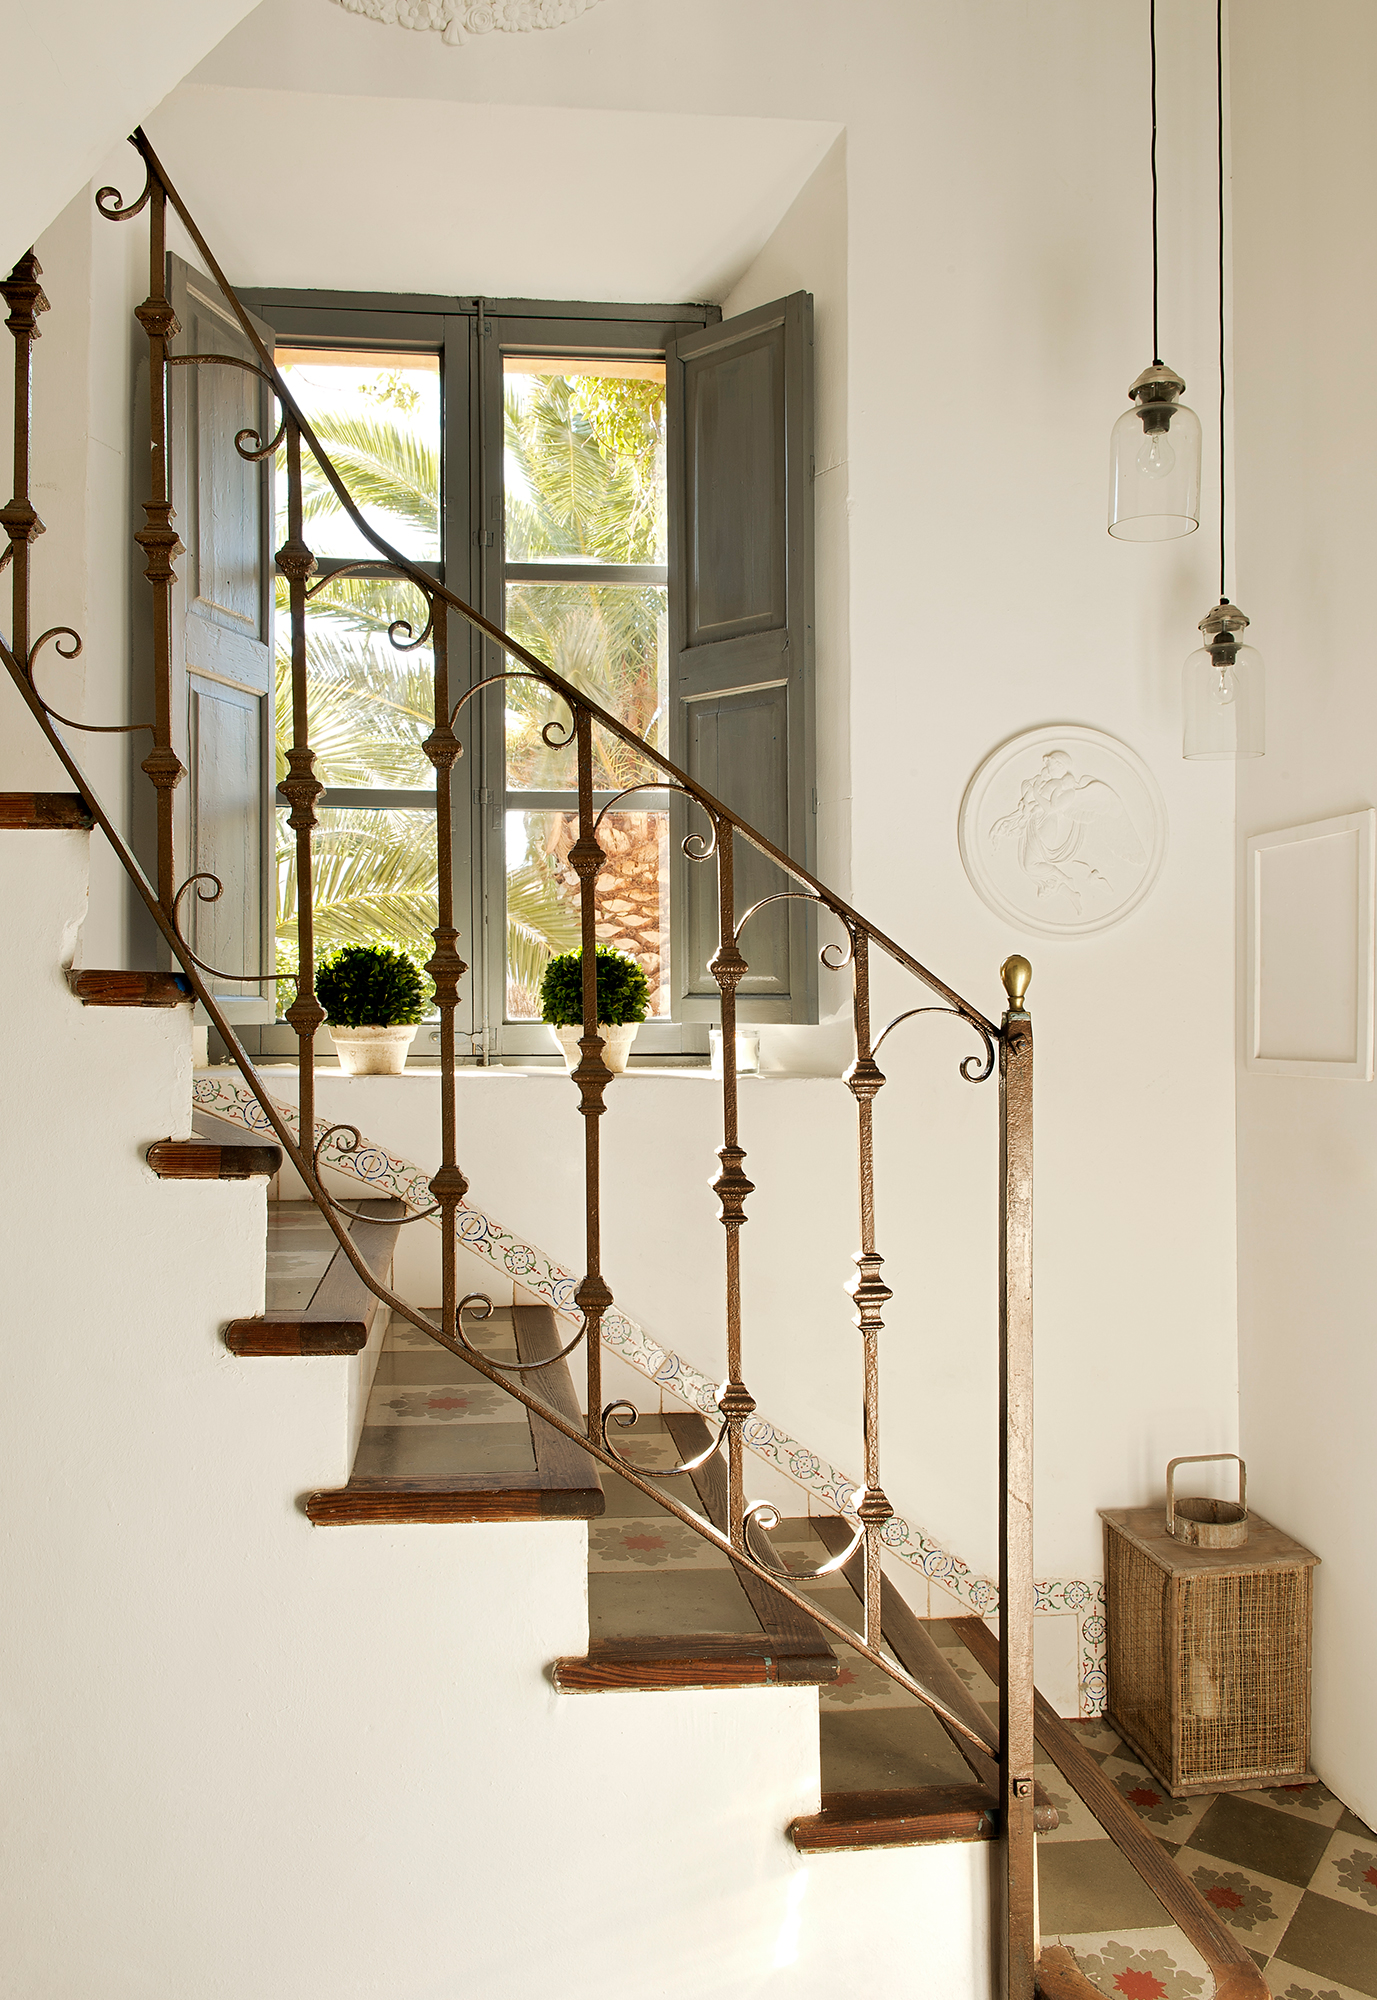 Baldosas para escaleras mrmol crema marfil escalera - Baldosas para interiores ...